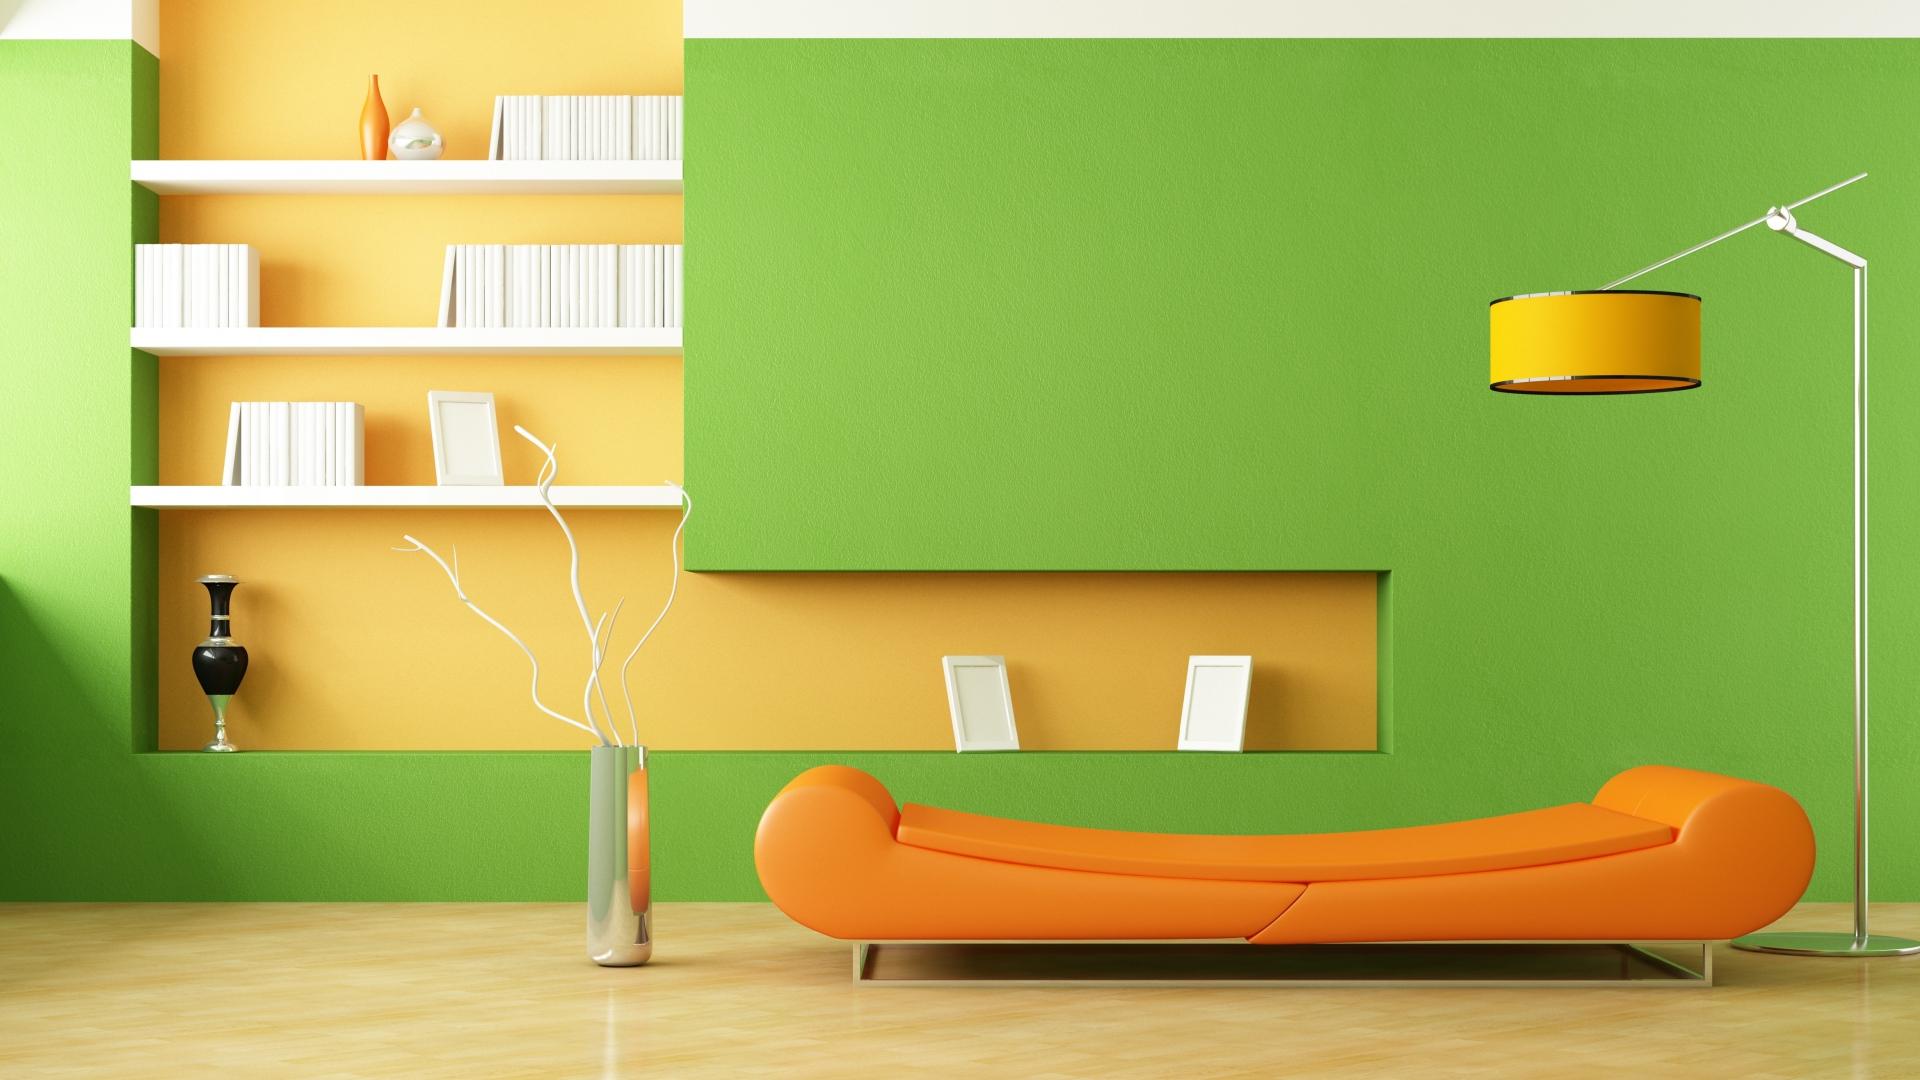 Download Wallpaper 1920x1080 Interior Design Style Minimalism